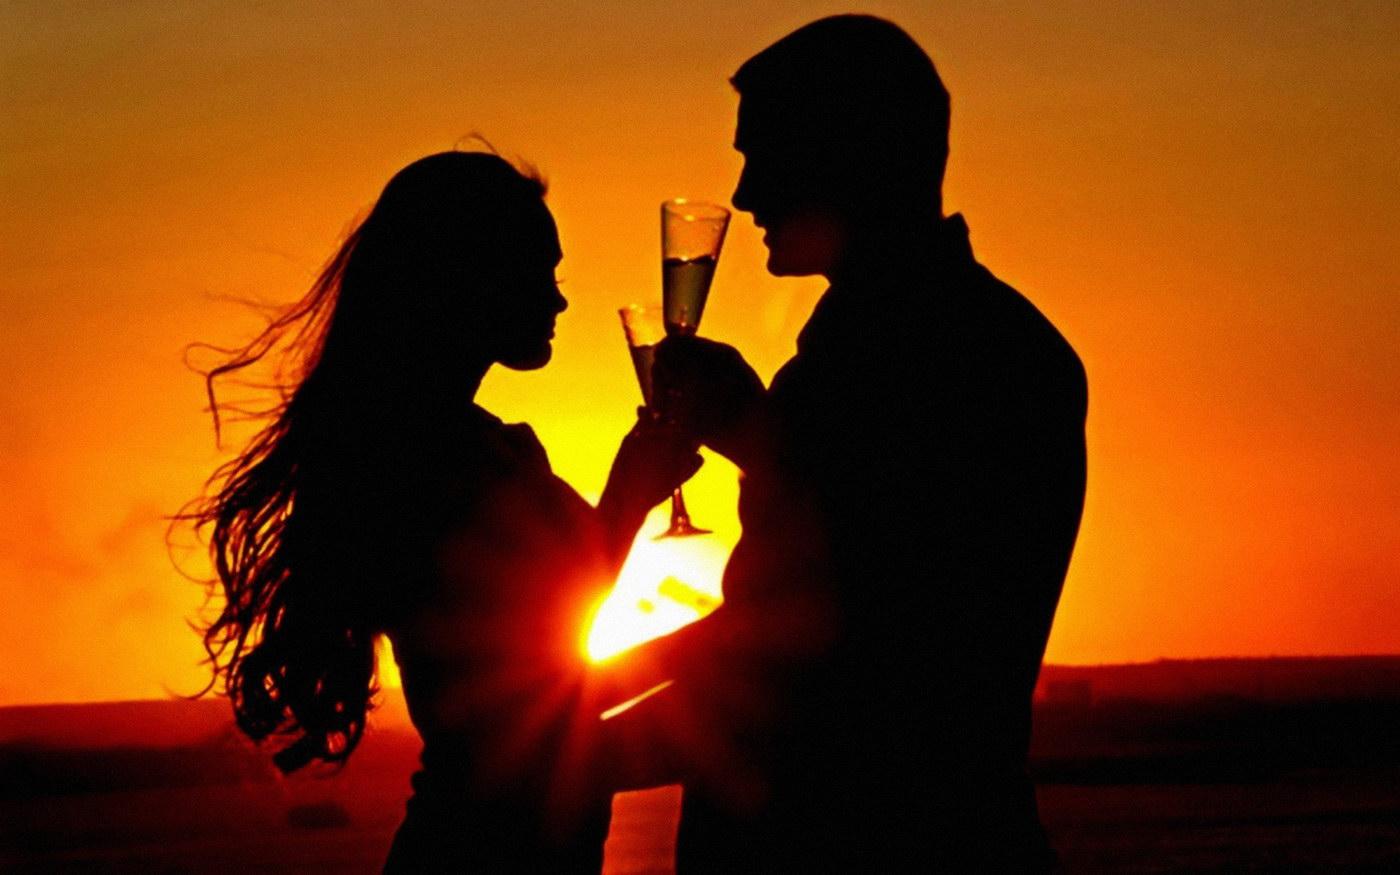 Despre casnicie, iubire si relatii